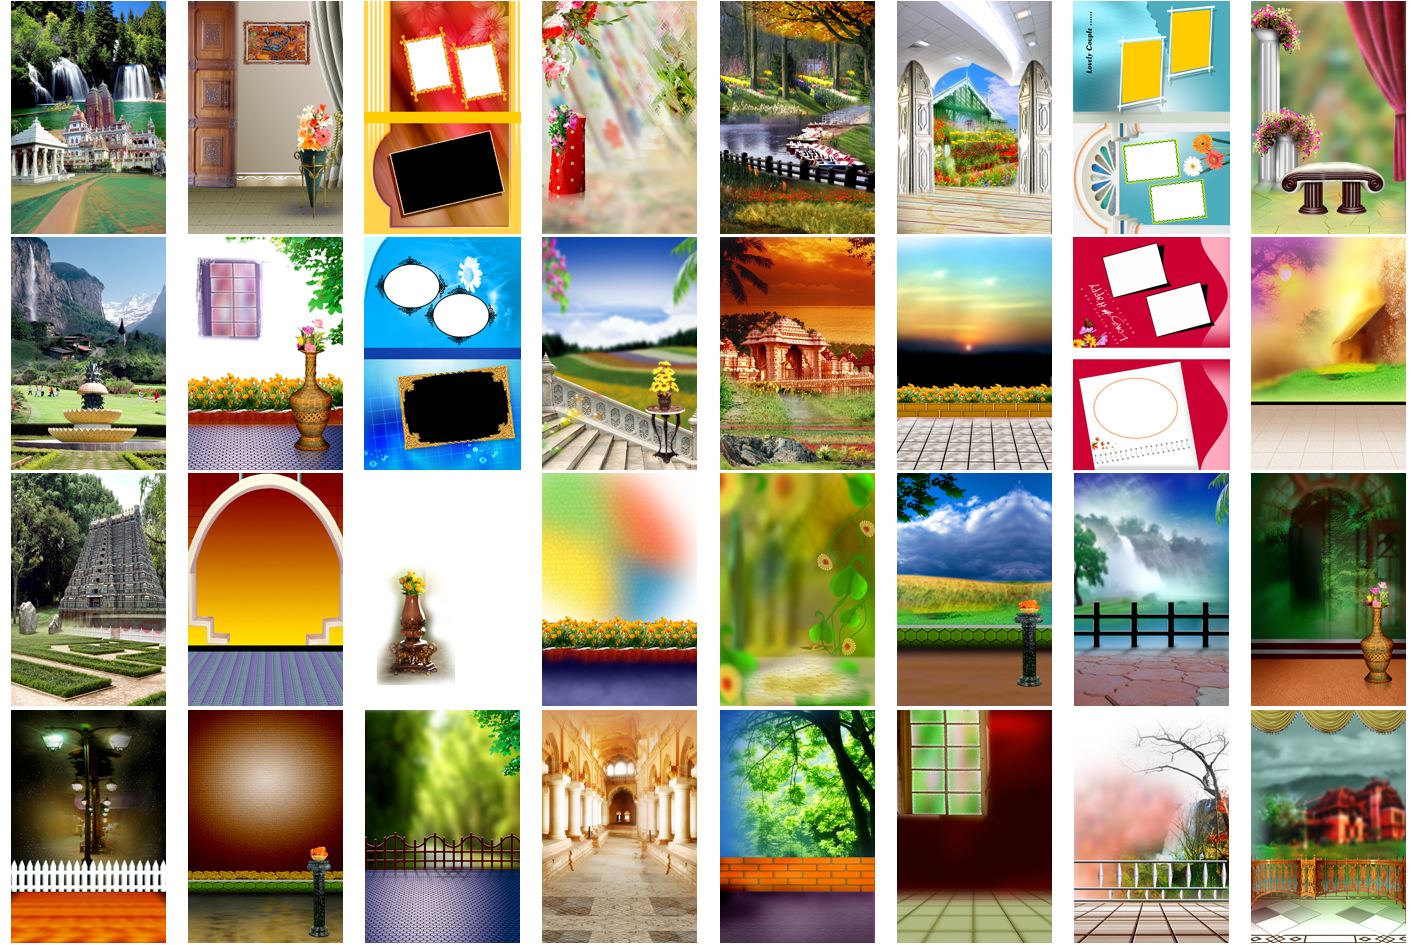 Studio Background, 4x6 Background